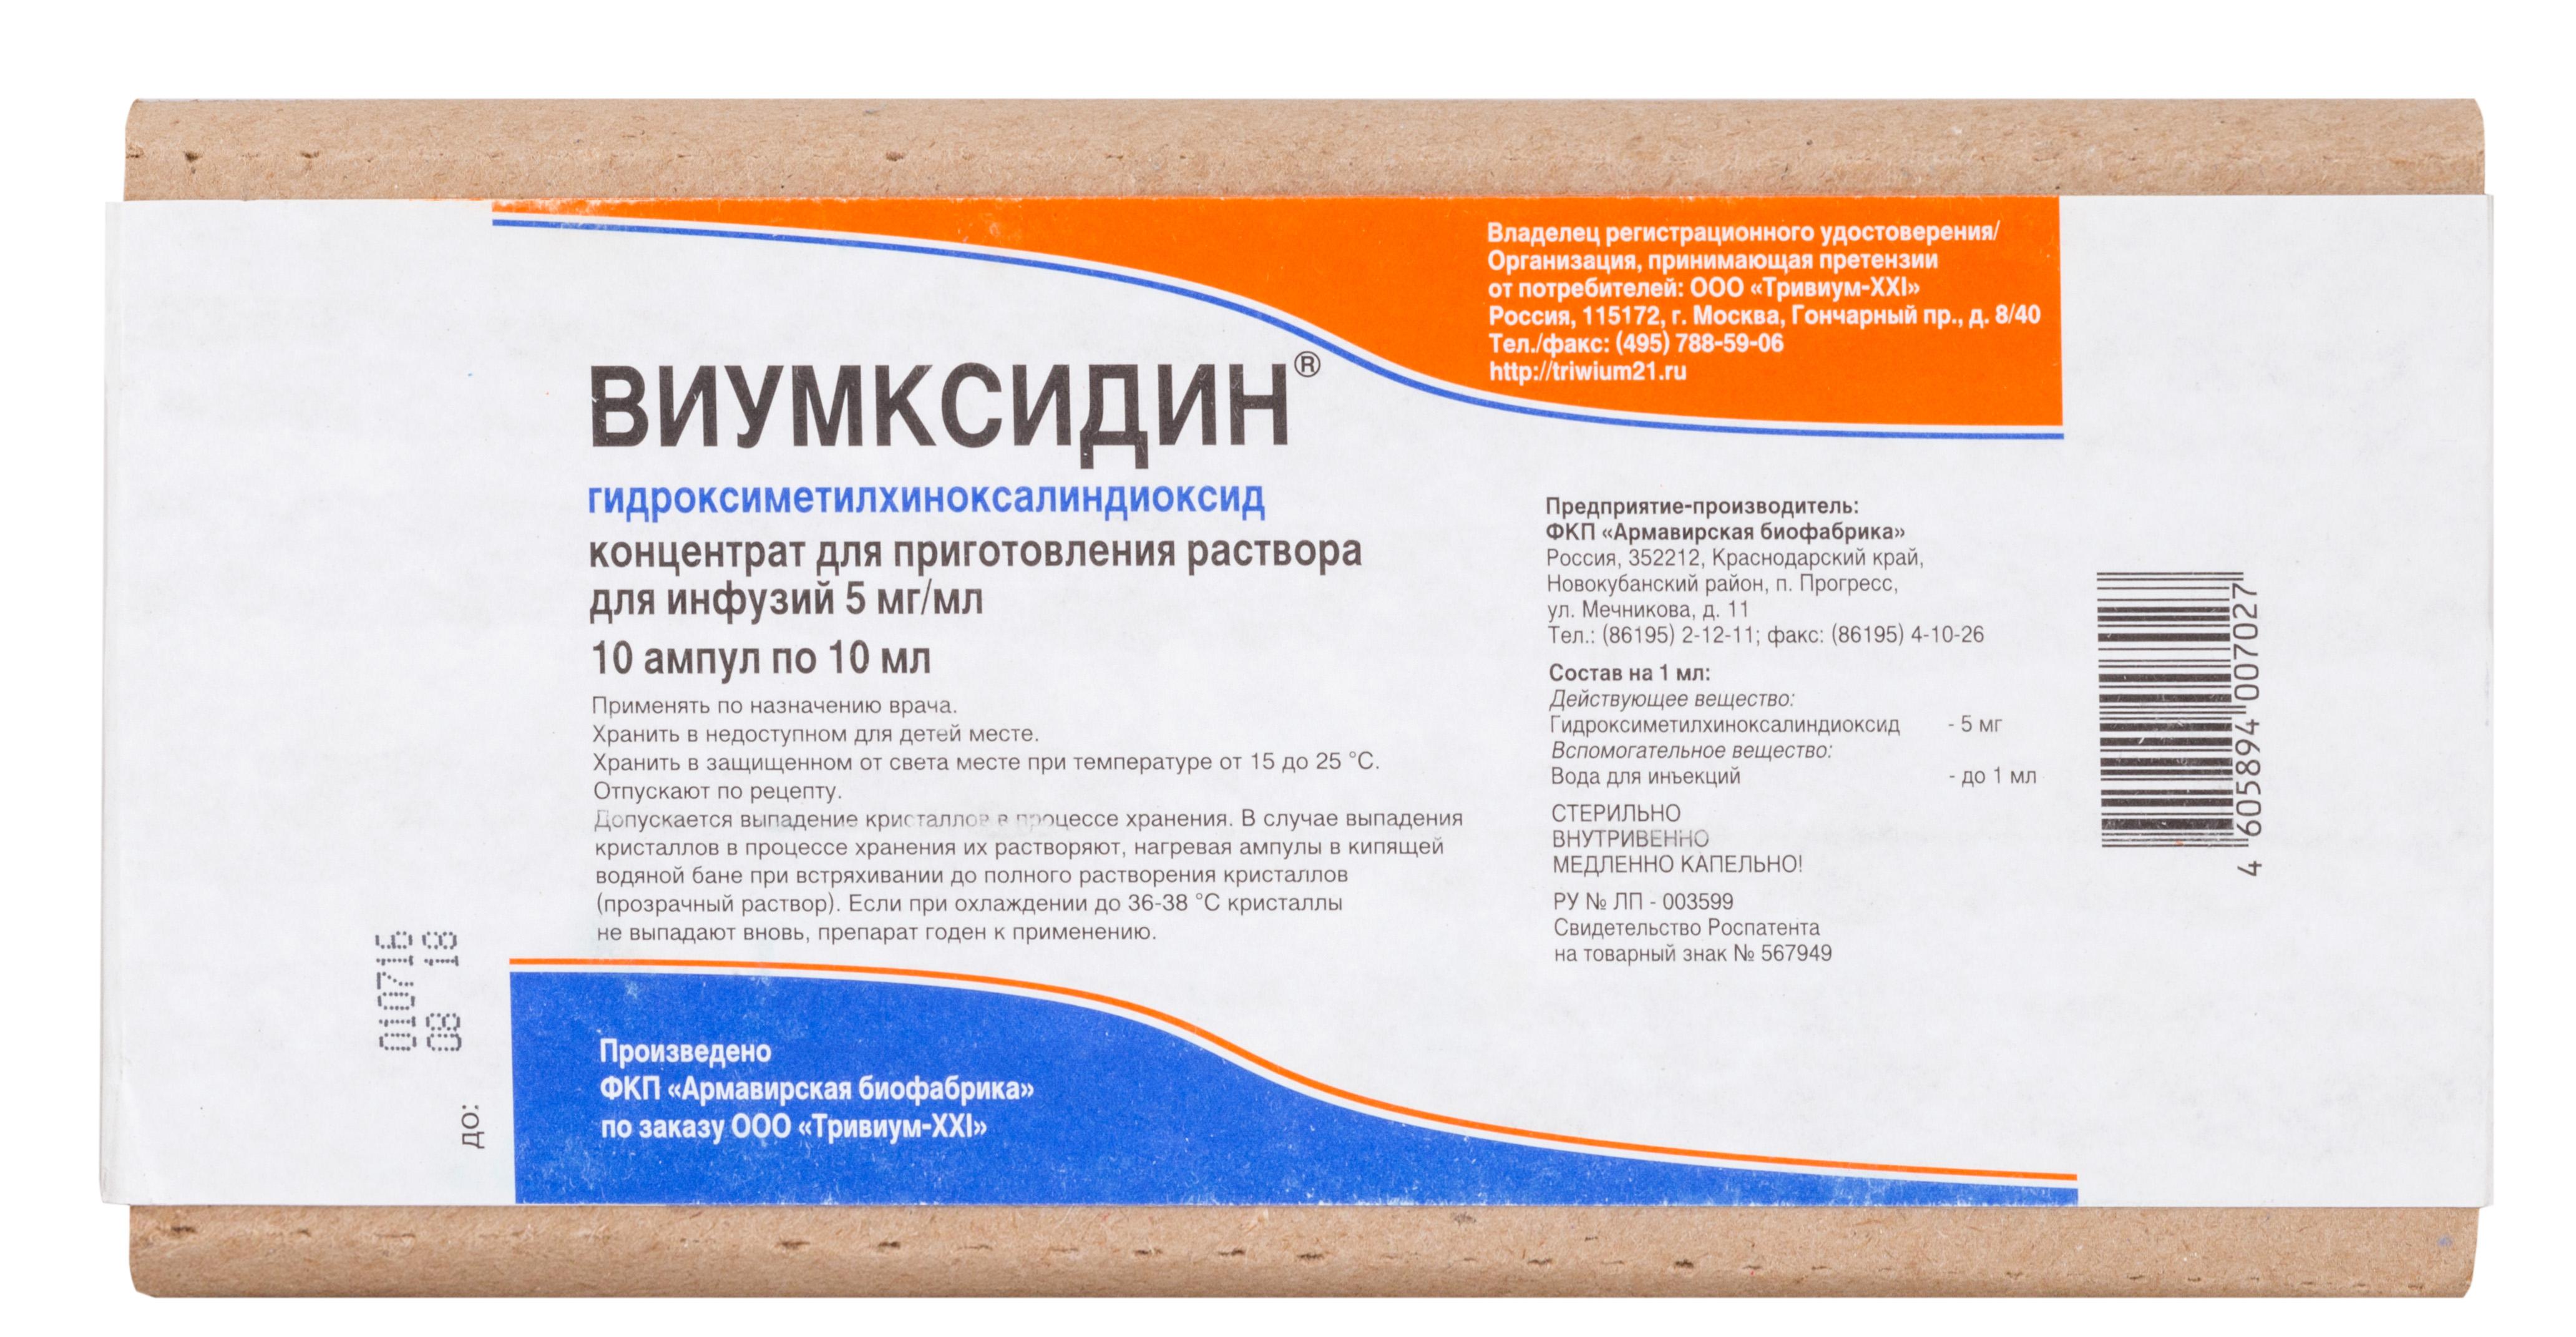 Виумксидин конц. д/приг. р-ра д/инф. 5мг/мл 10мл №10